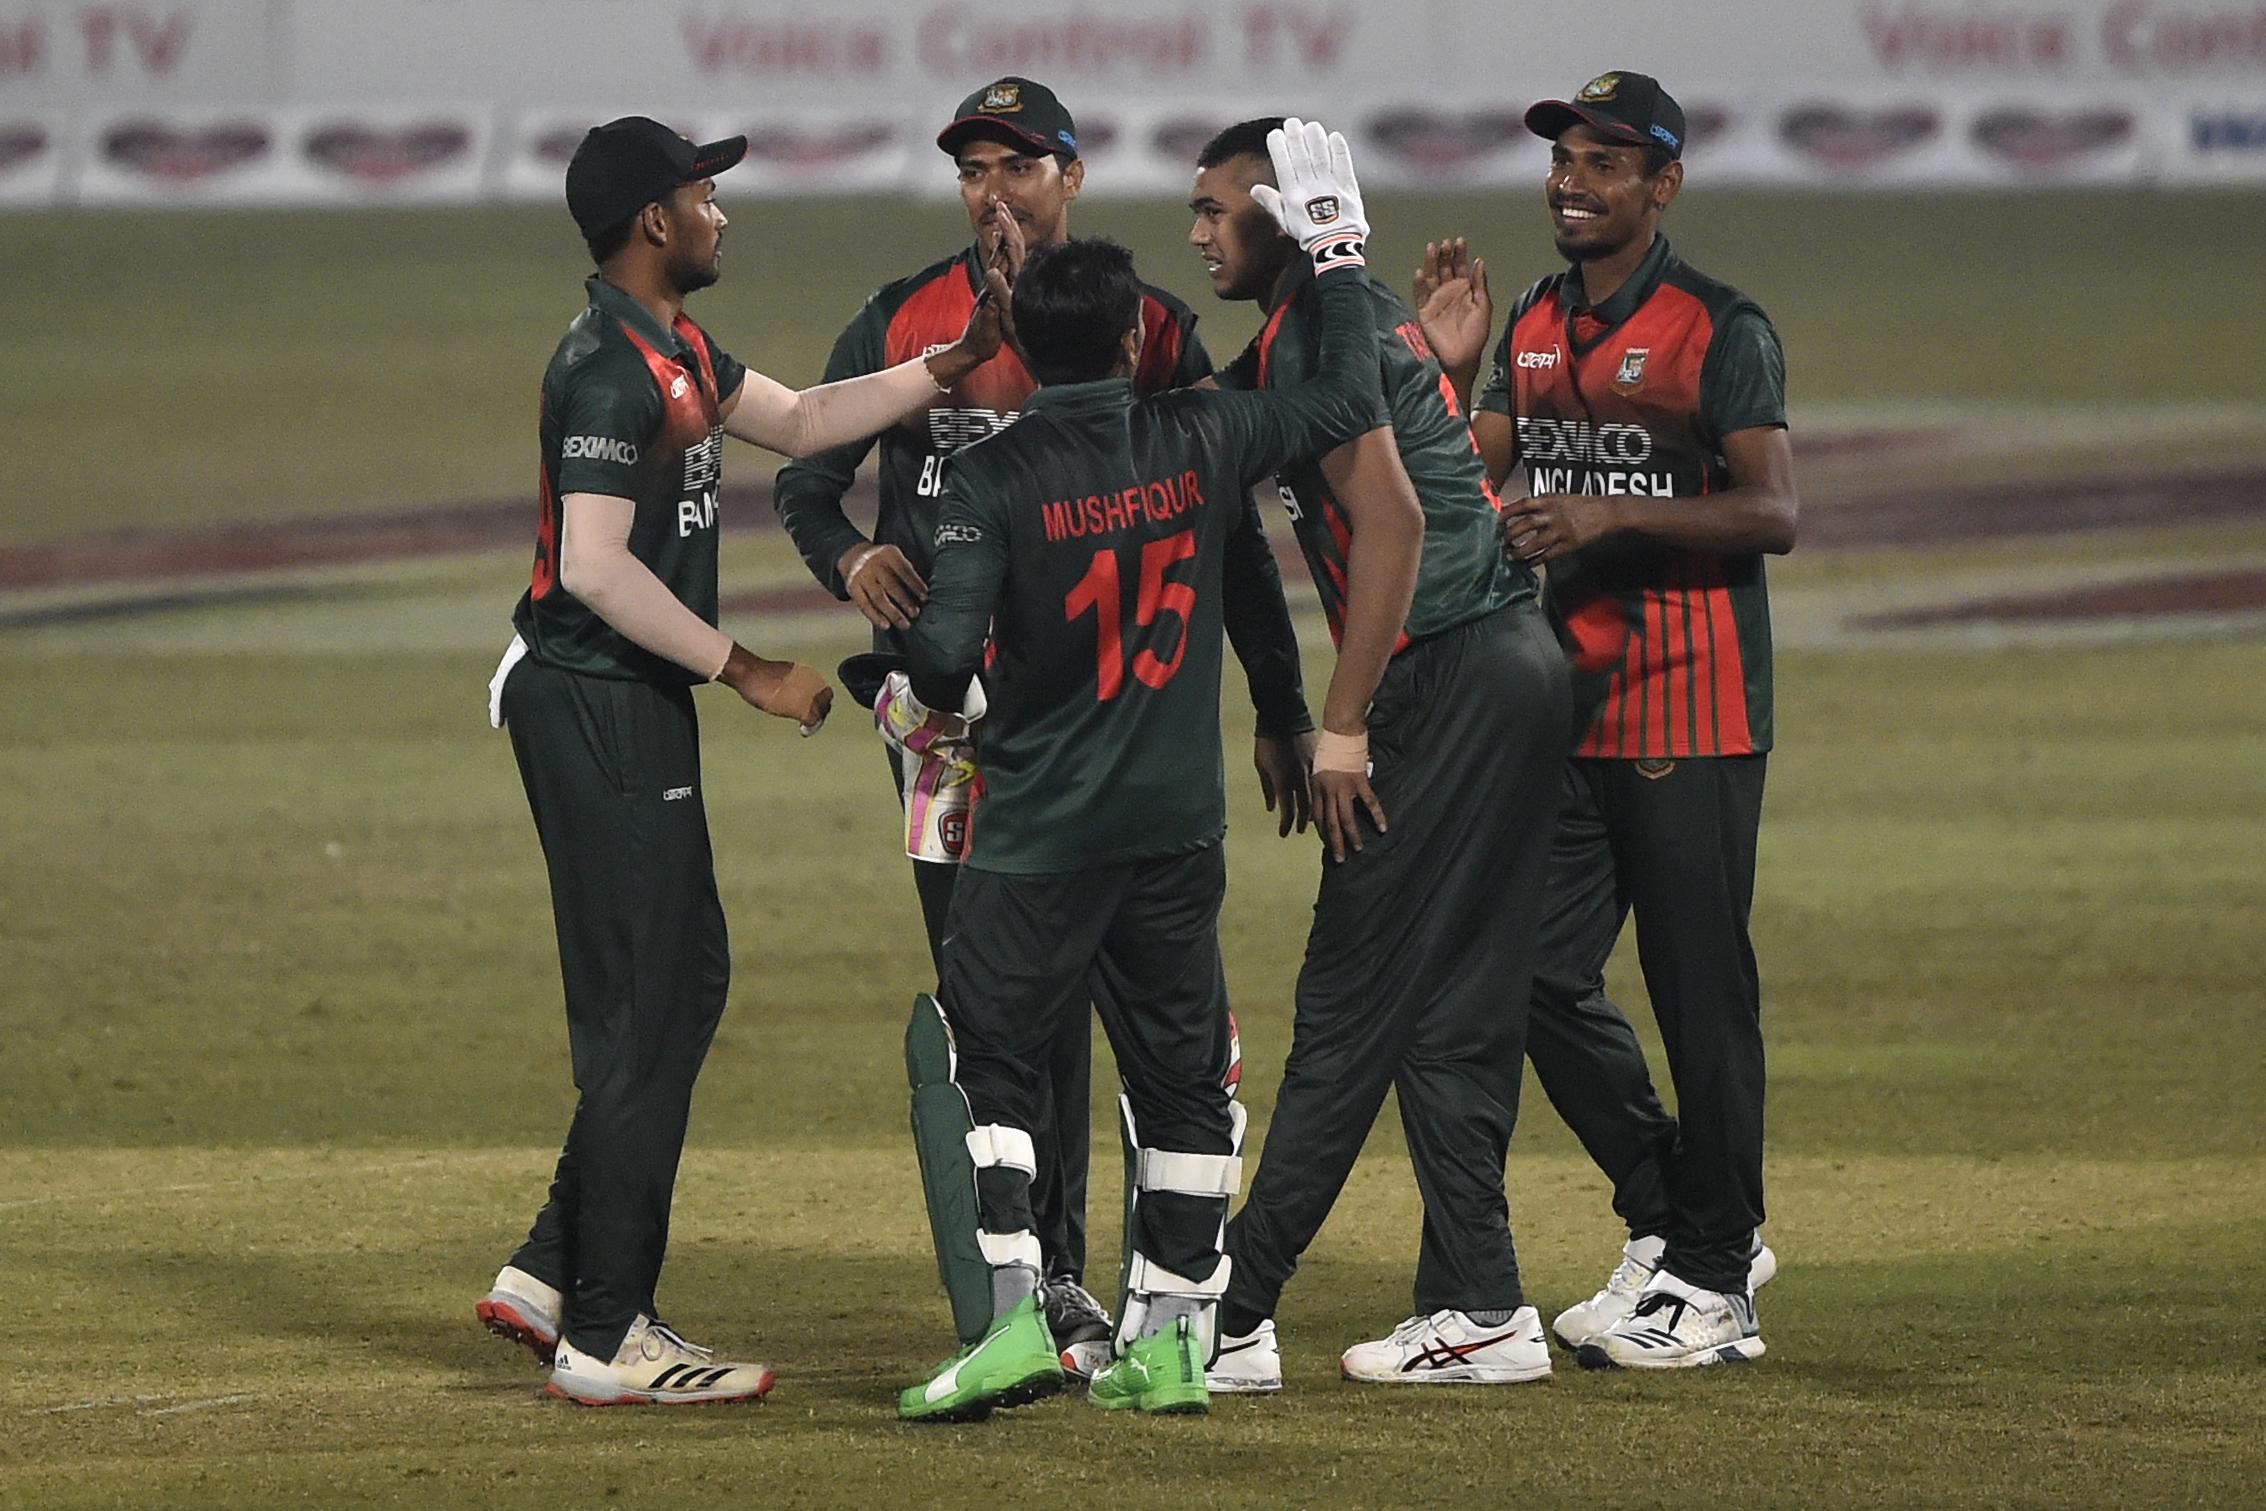 Bangladesh call up uncapped Nasum Ahmed for New Zealand tour - International Cricket Council